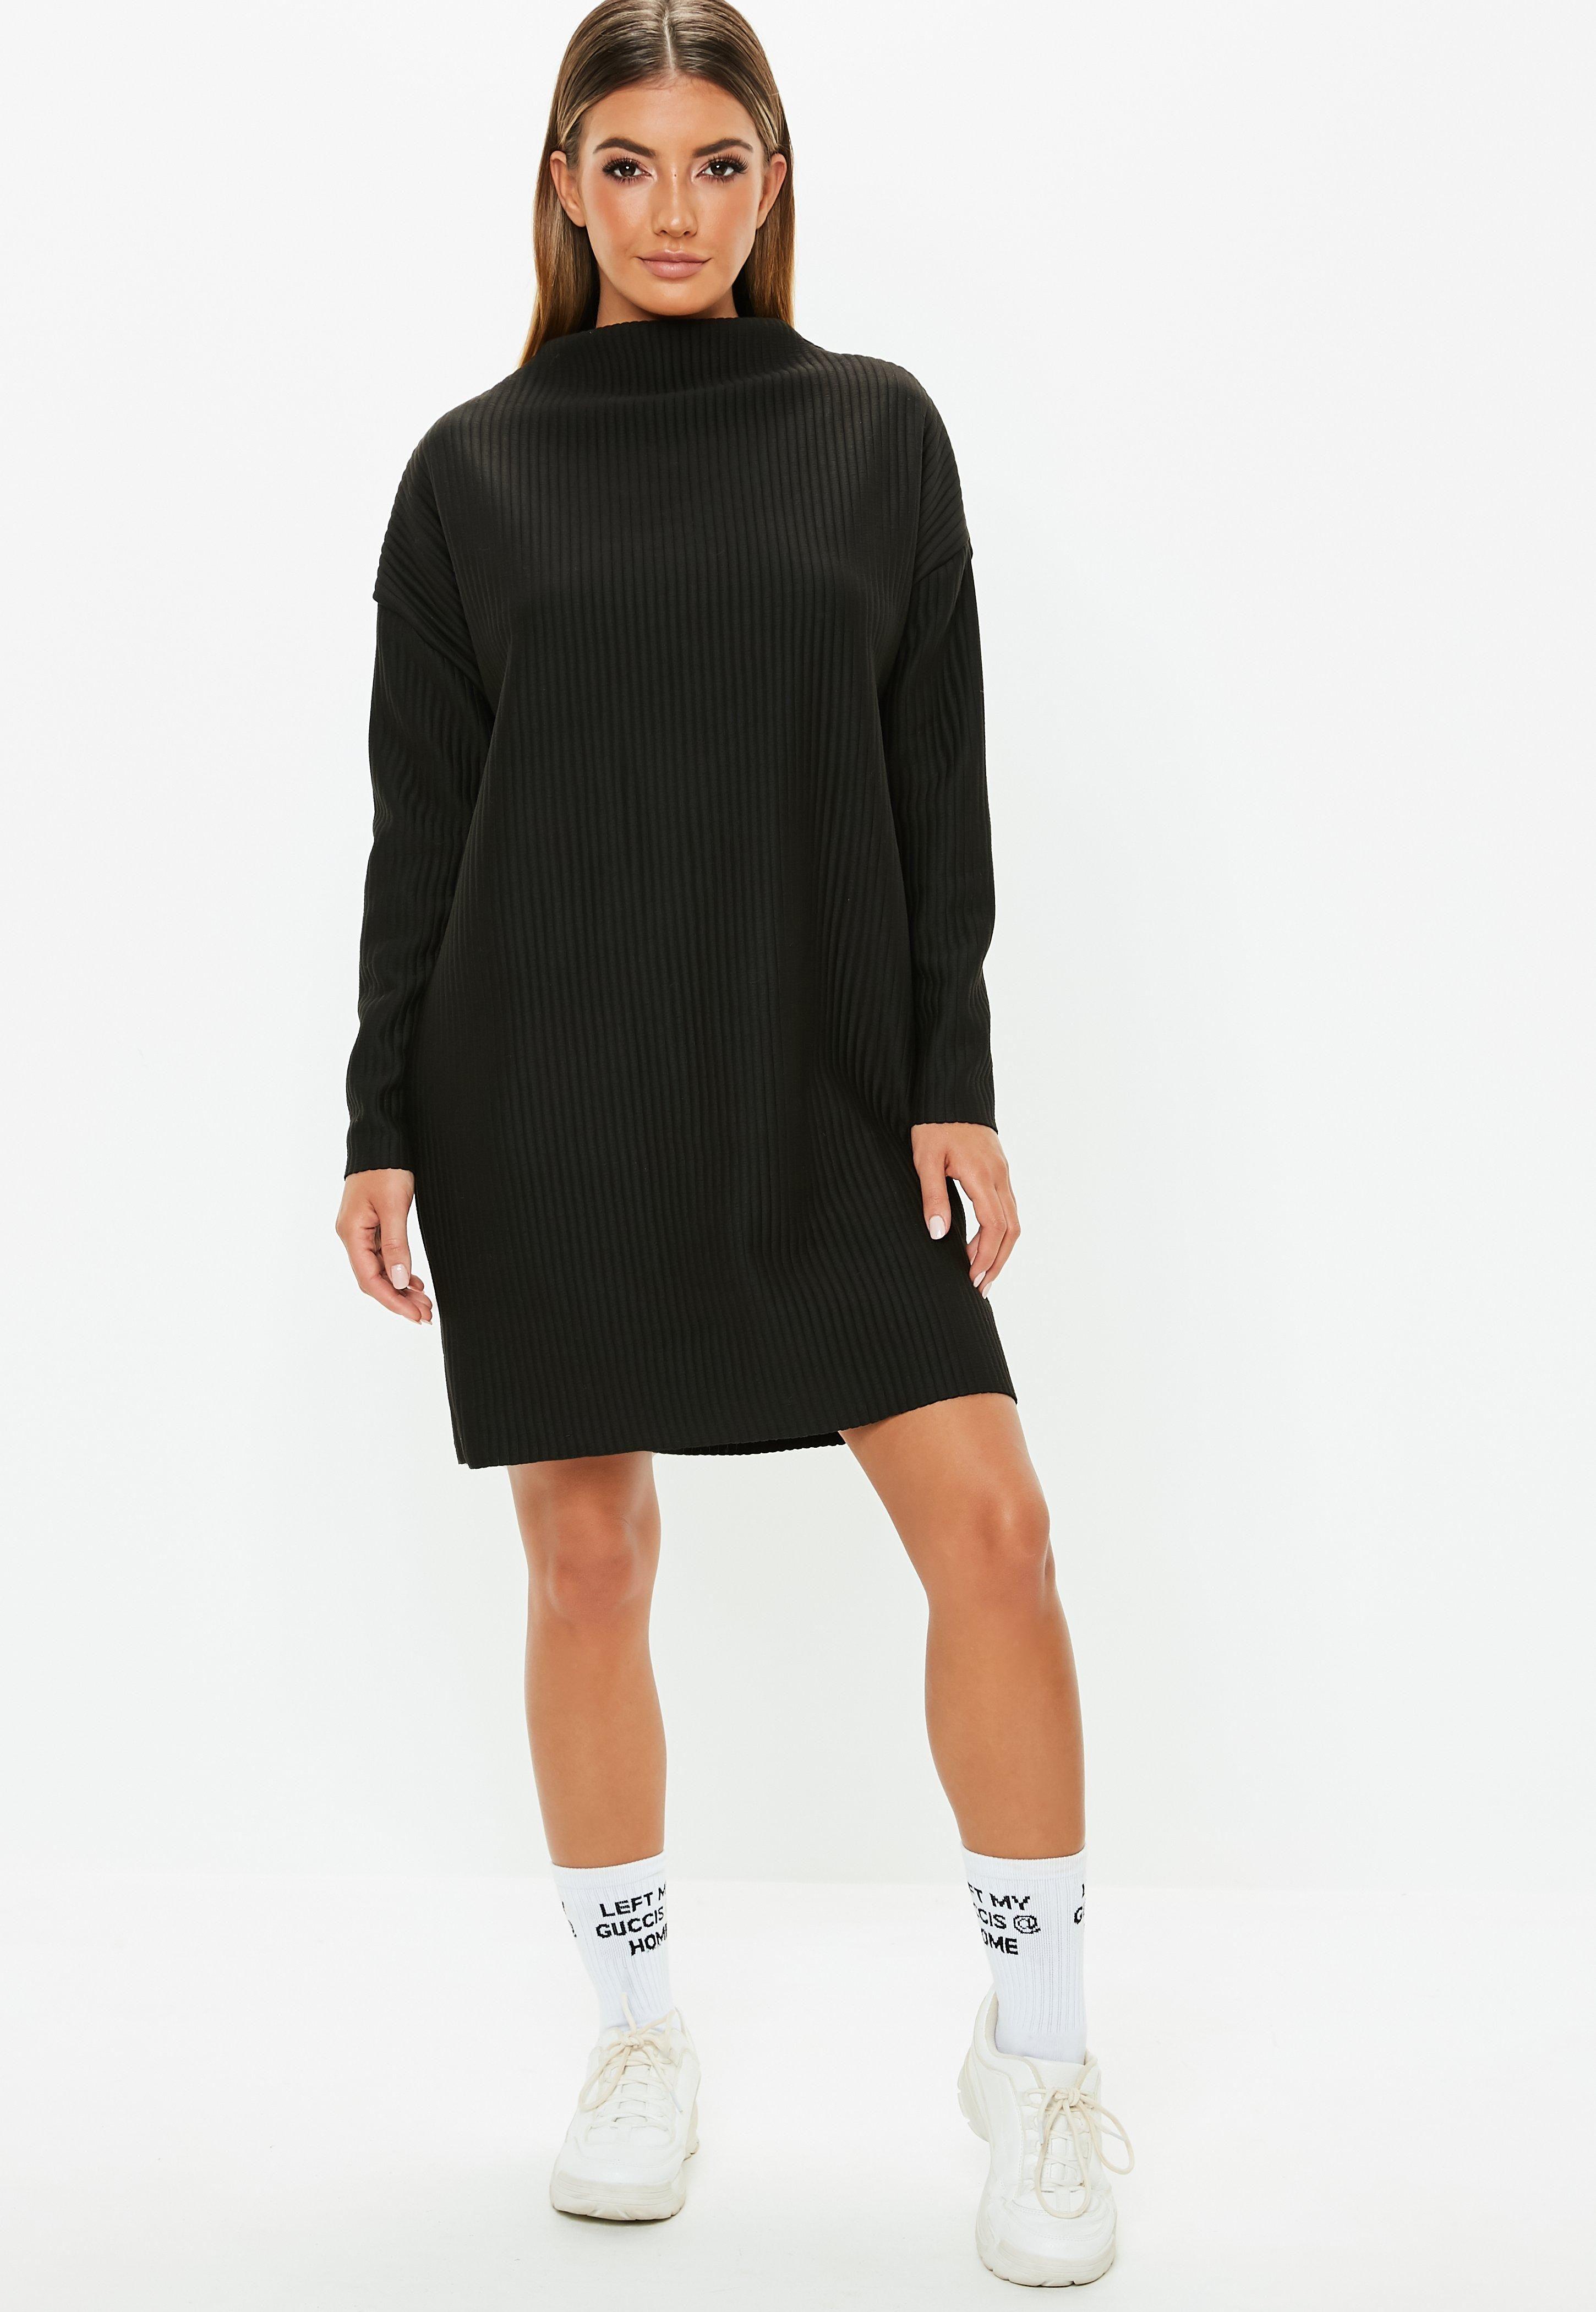 8b0cd35b474 Petite Black Oversized Ribbed Sweater Dress  Sponsored  Oversized